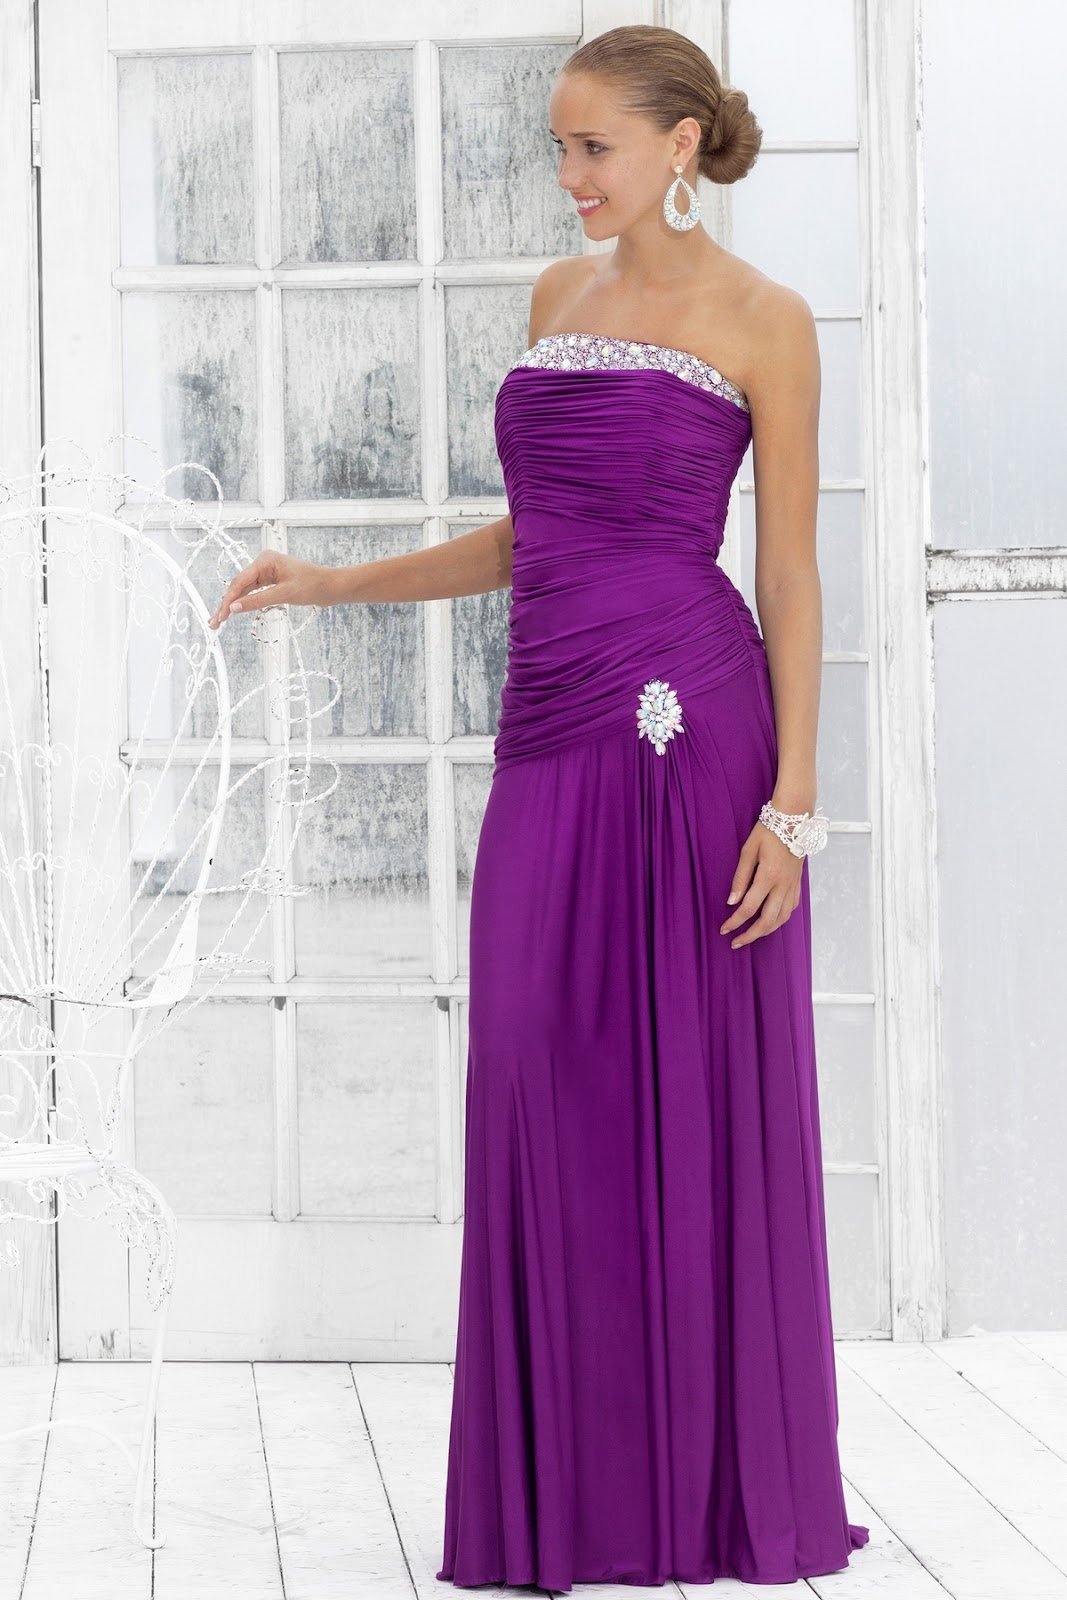 short prom dresses: February 2012